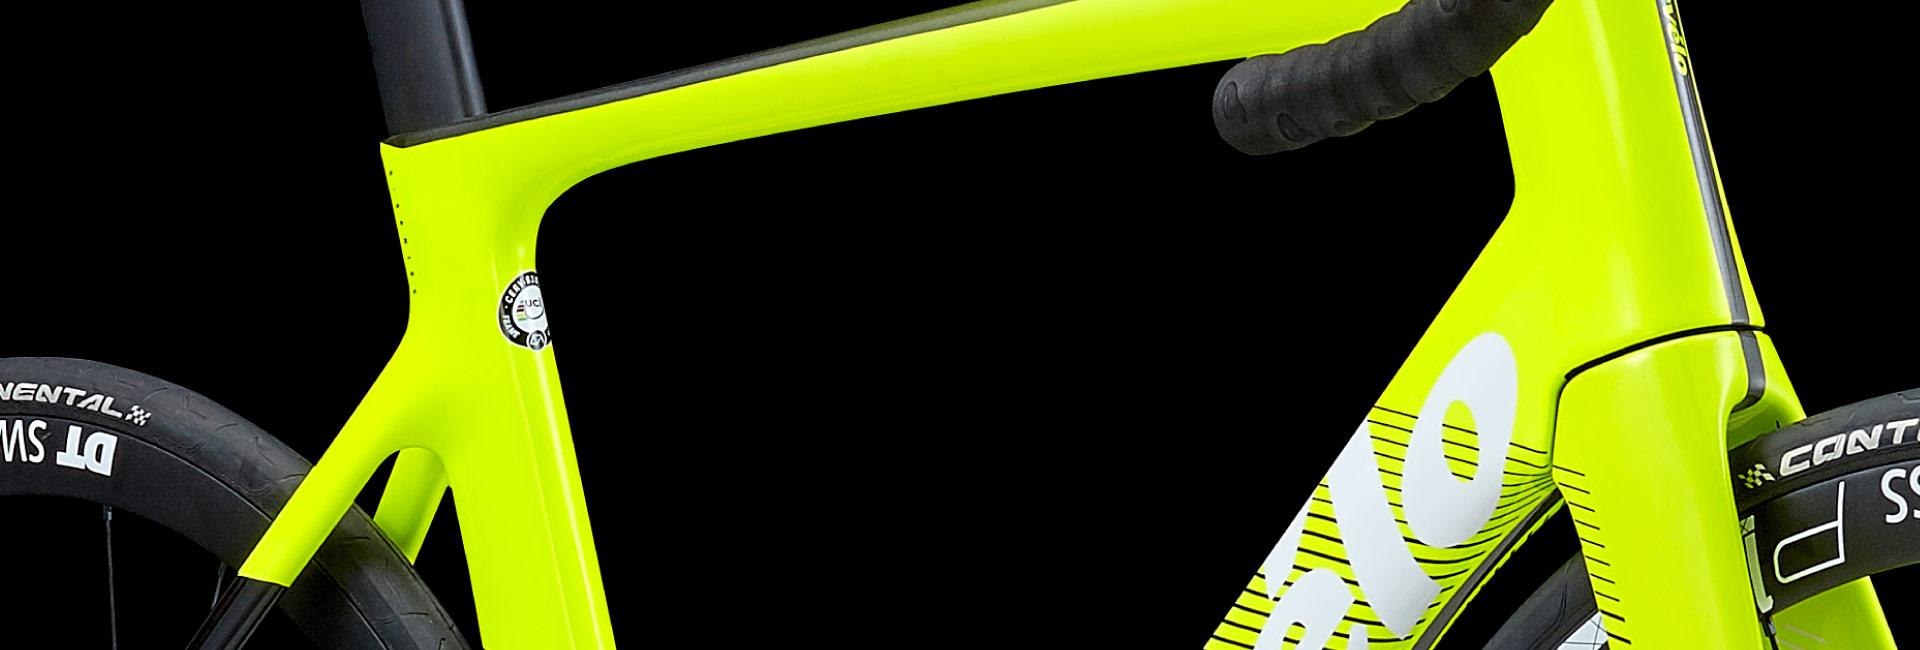 CERVELO-19-S3-DISC-ULT-8020成車-51CM-黑螢光黃